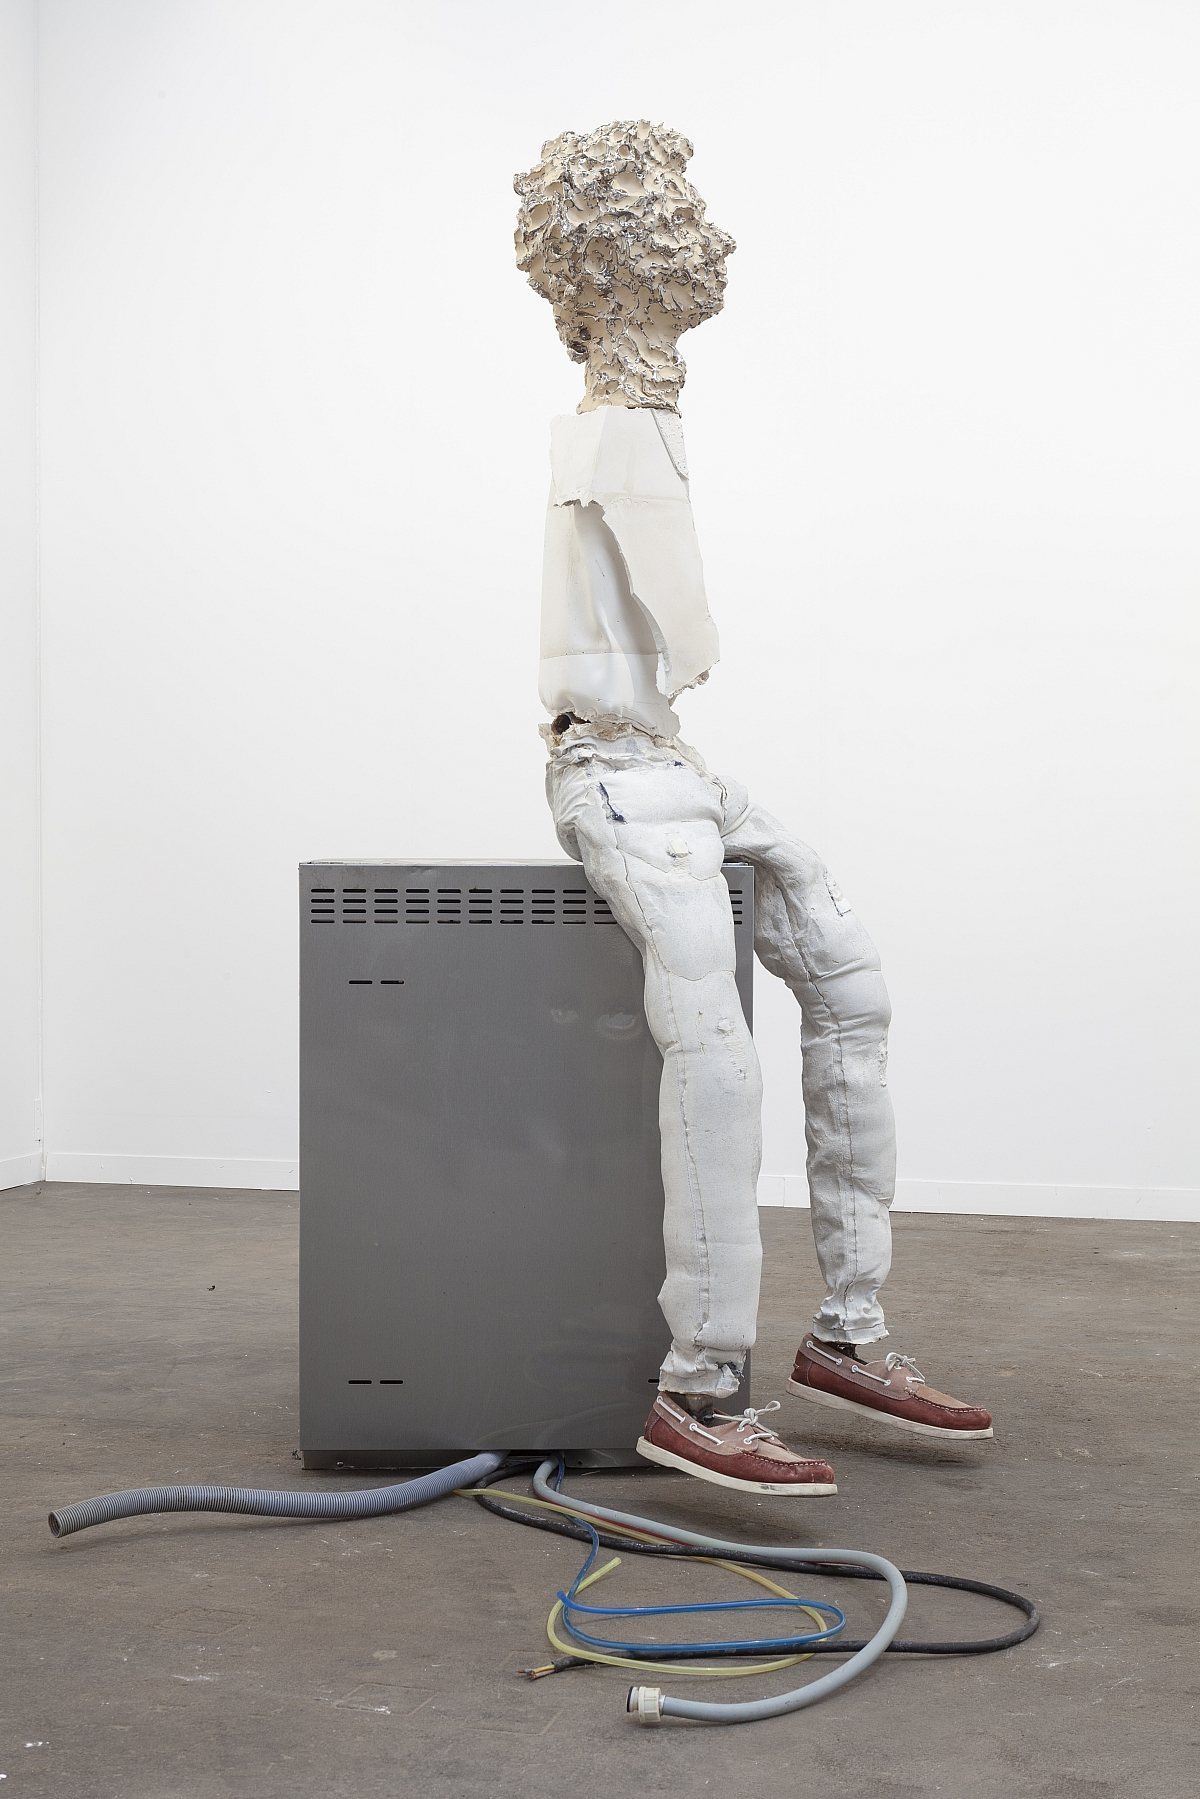 2019 04 21 Art Brussels 2019 115 bewerkt